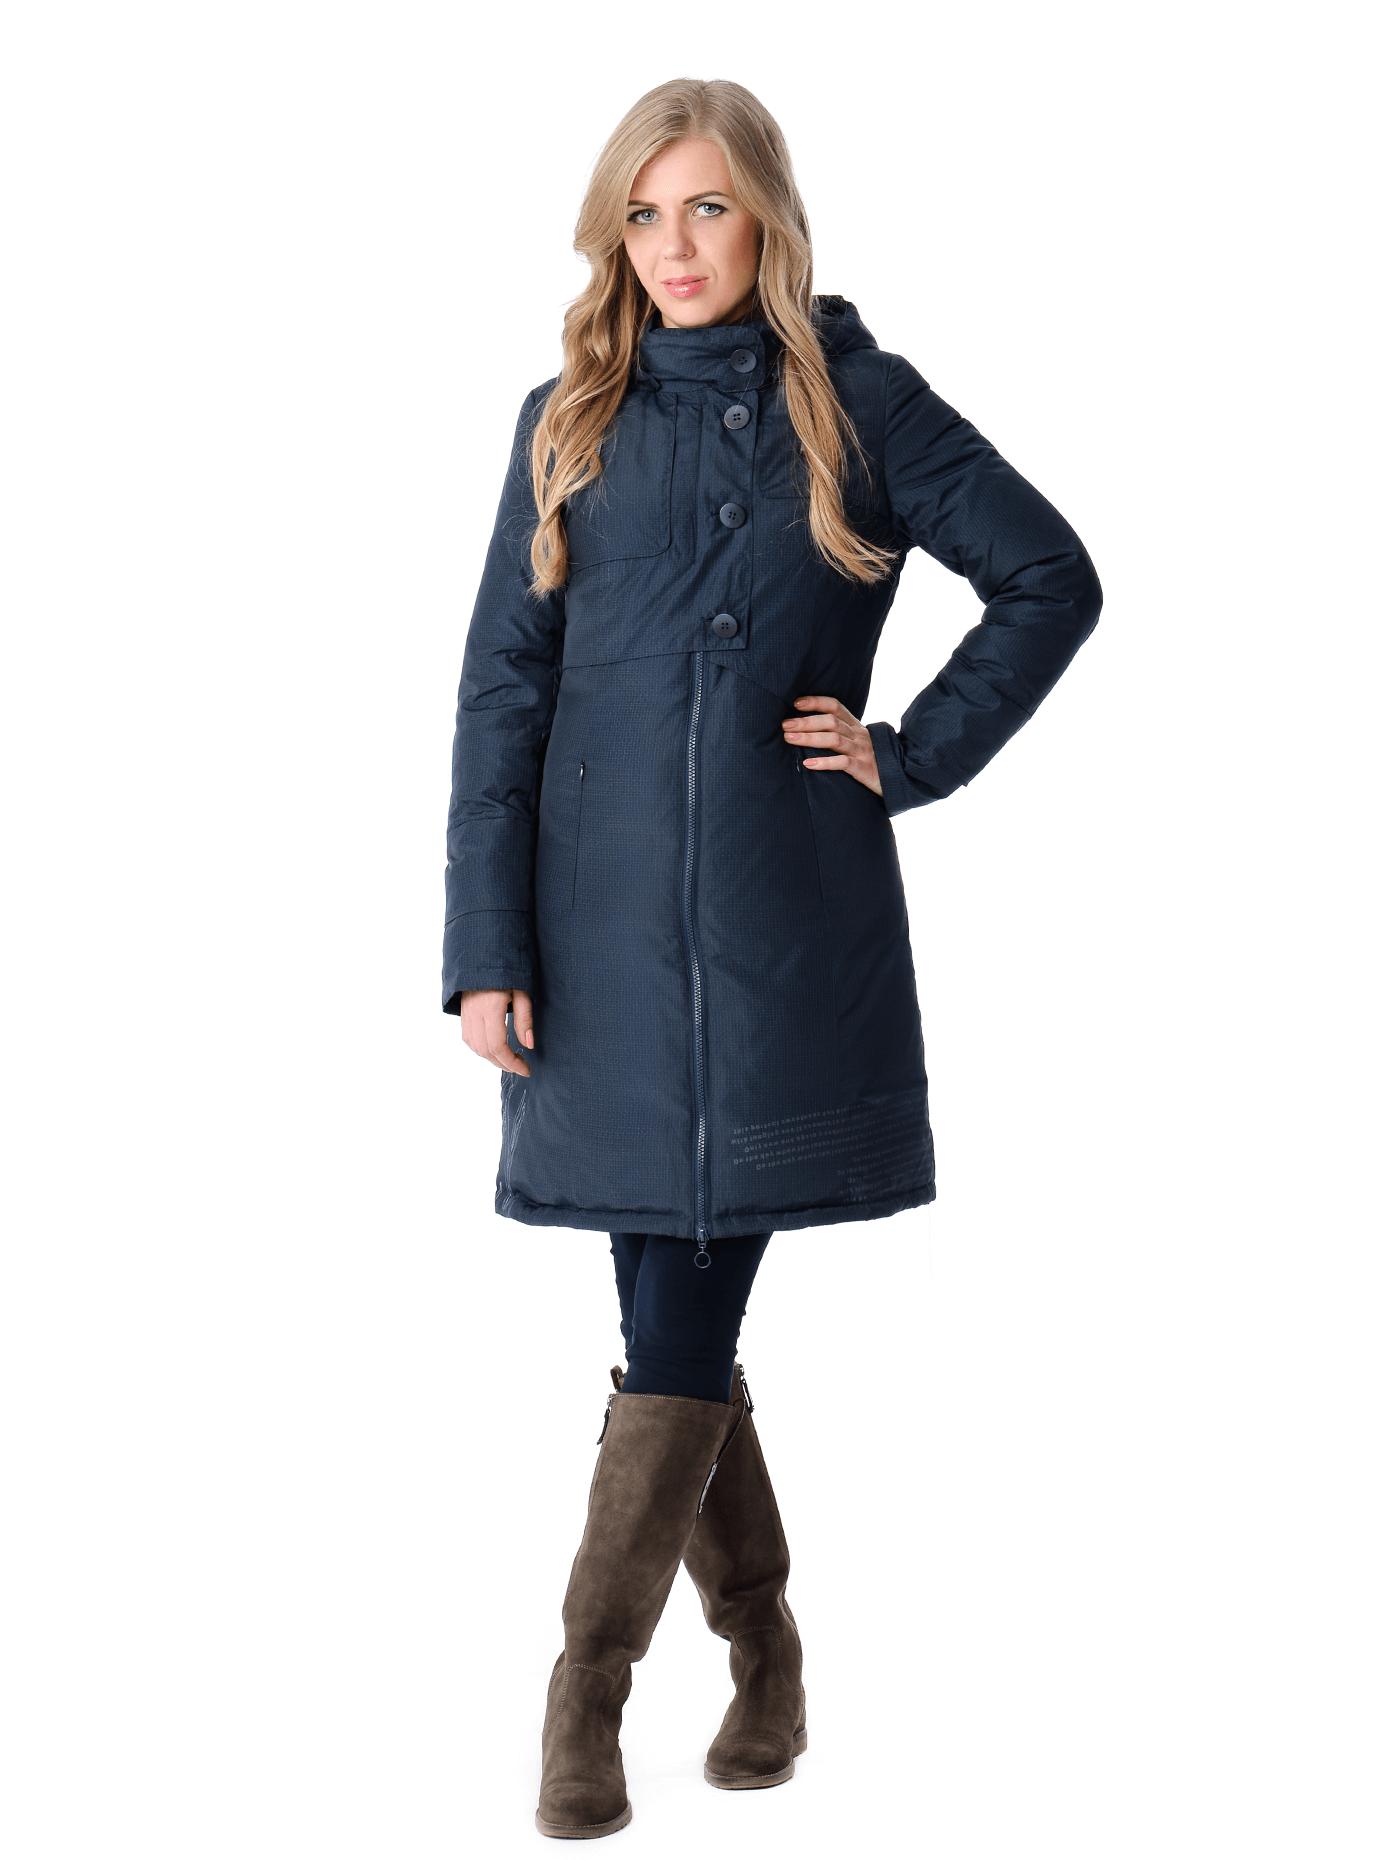 Пуховик женский зимний с капюшоном Тёмно-синий S (03-P19038): фото - Alster.ua